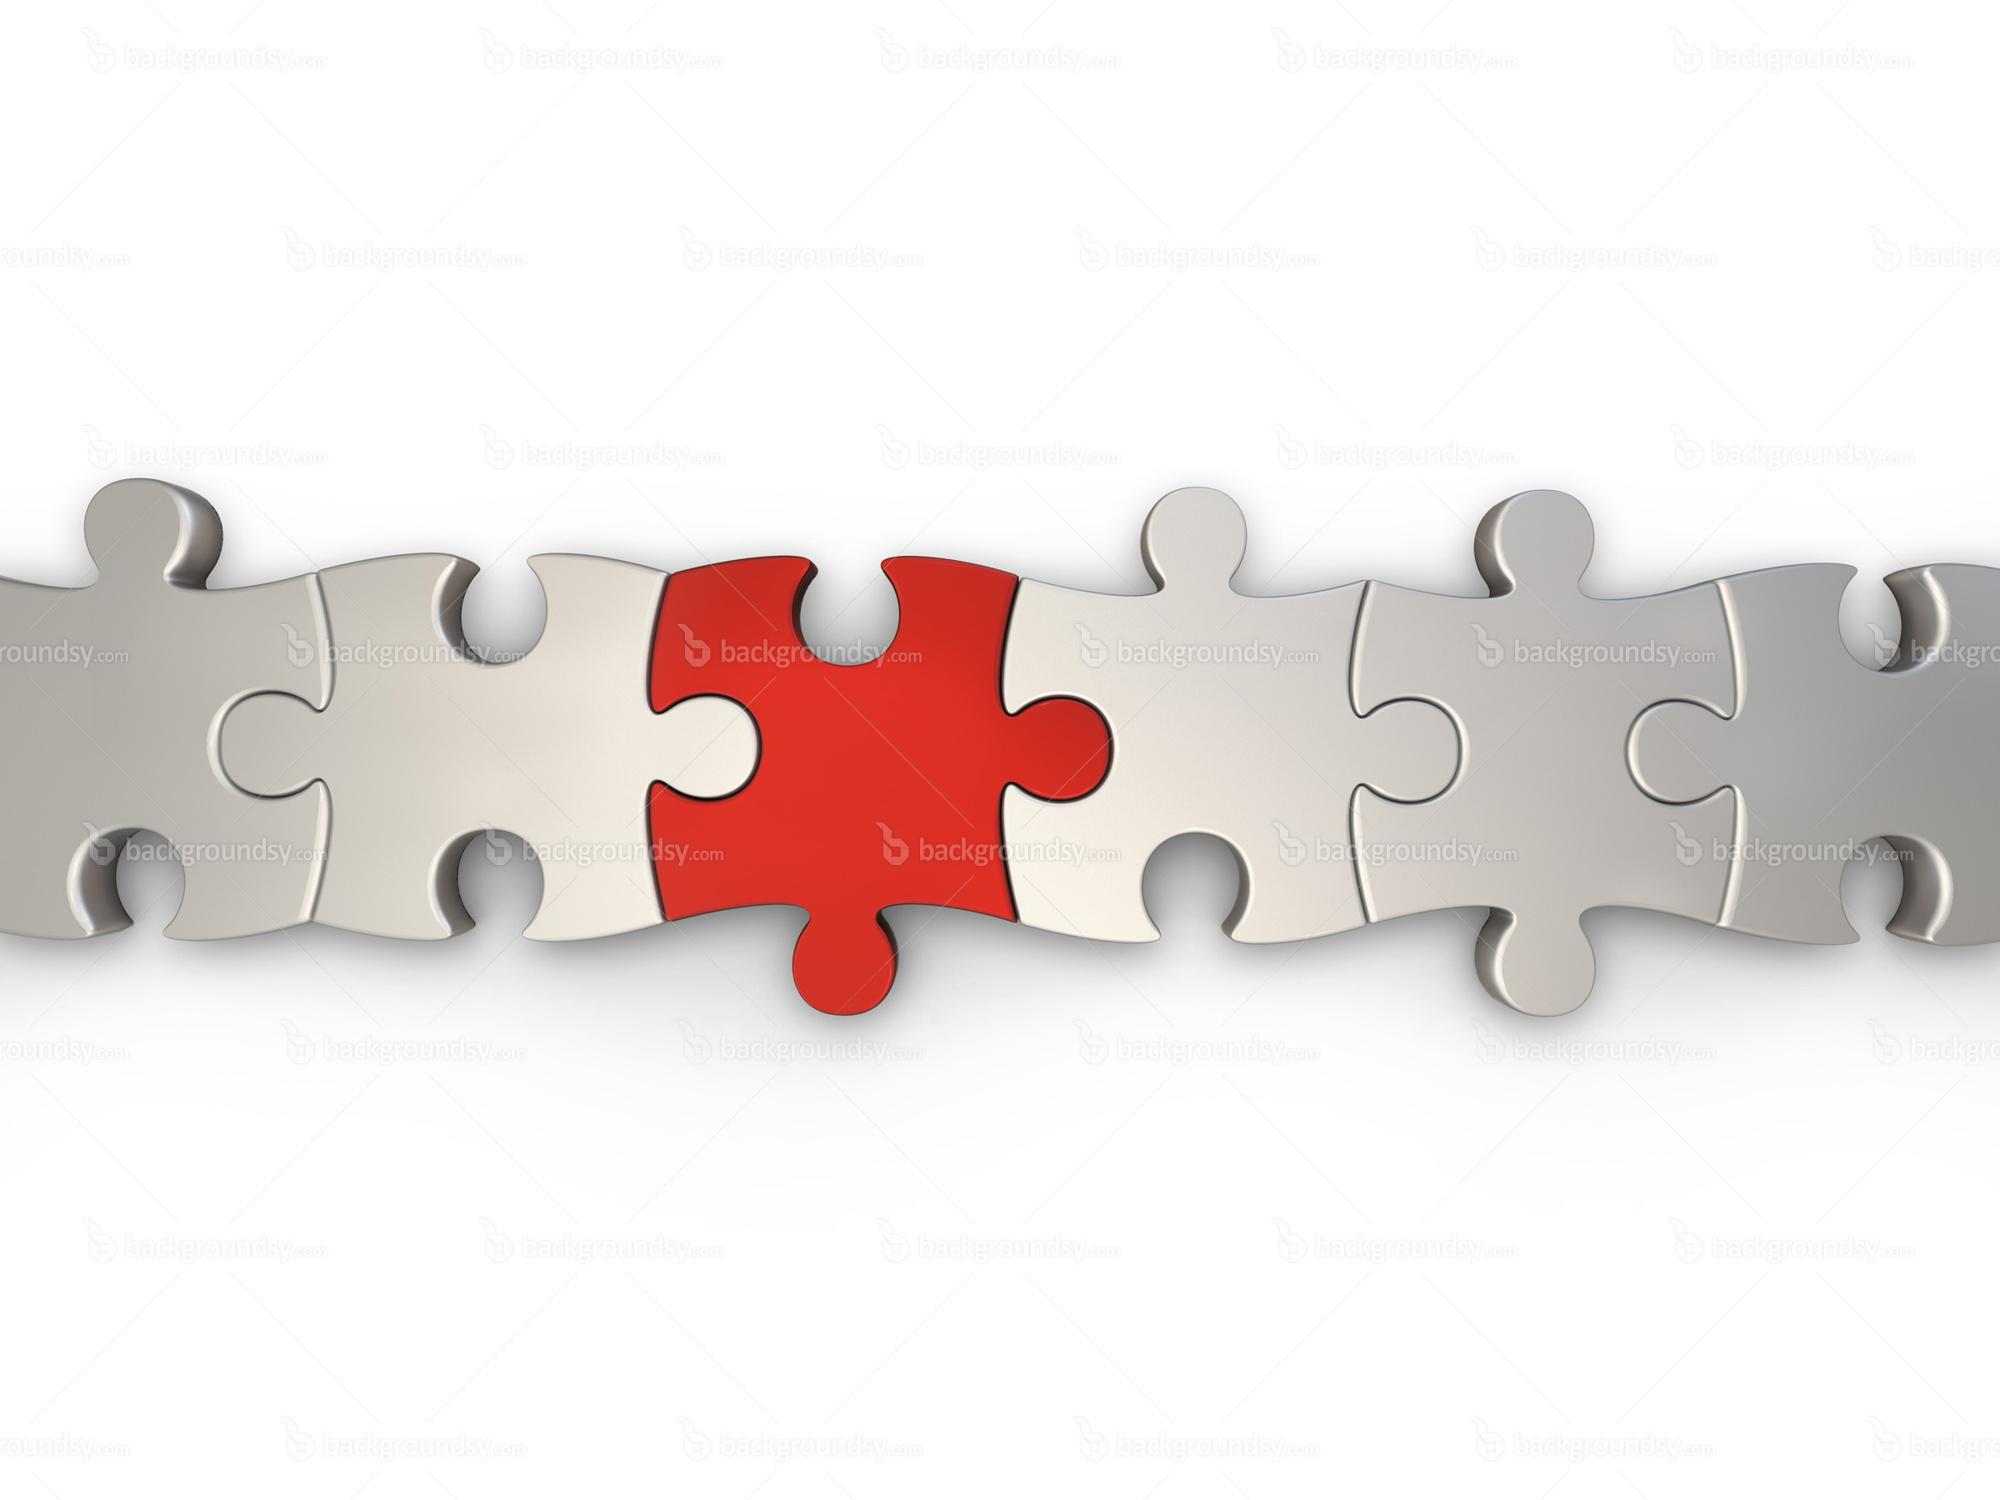 puzzle connection backgroundsy com